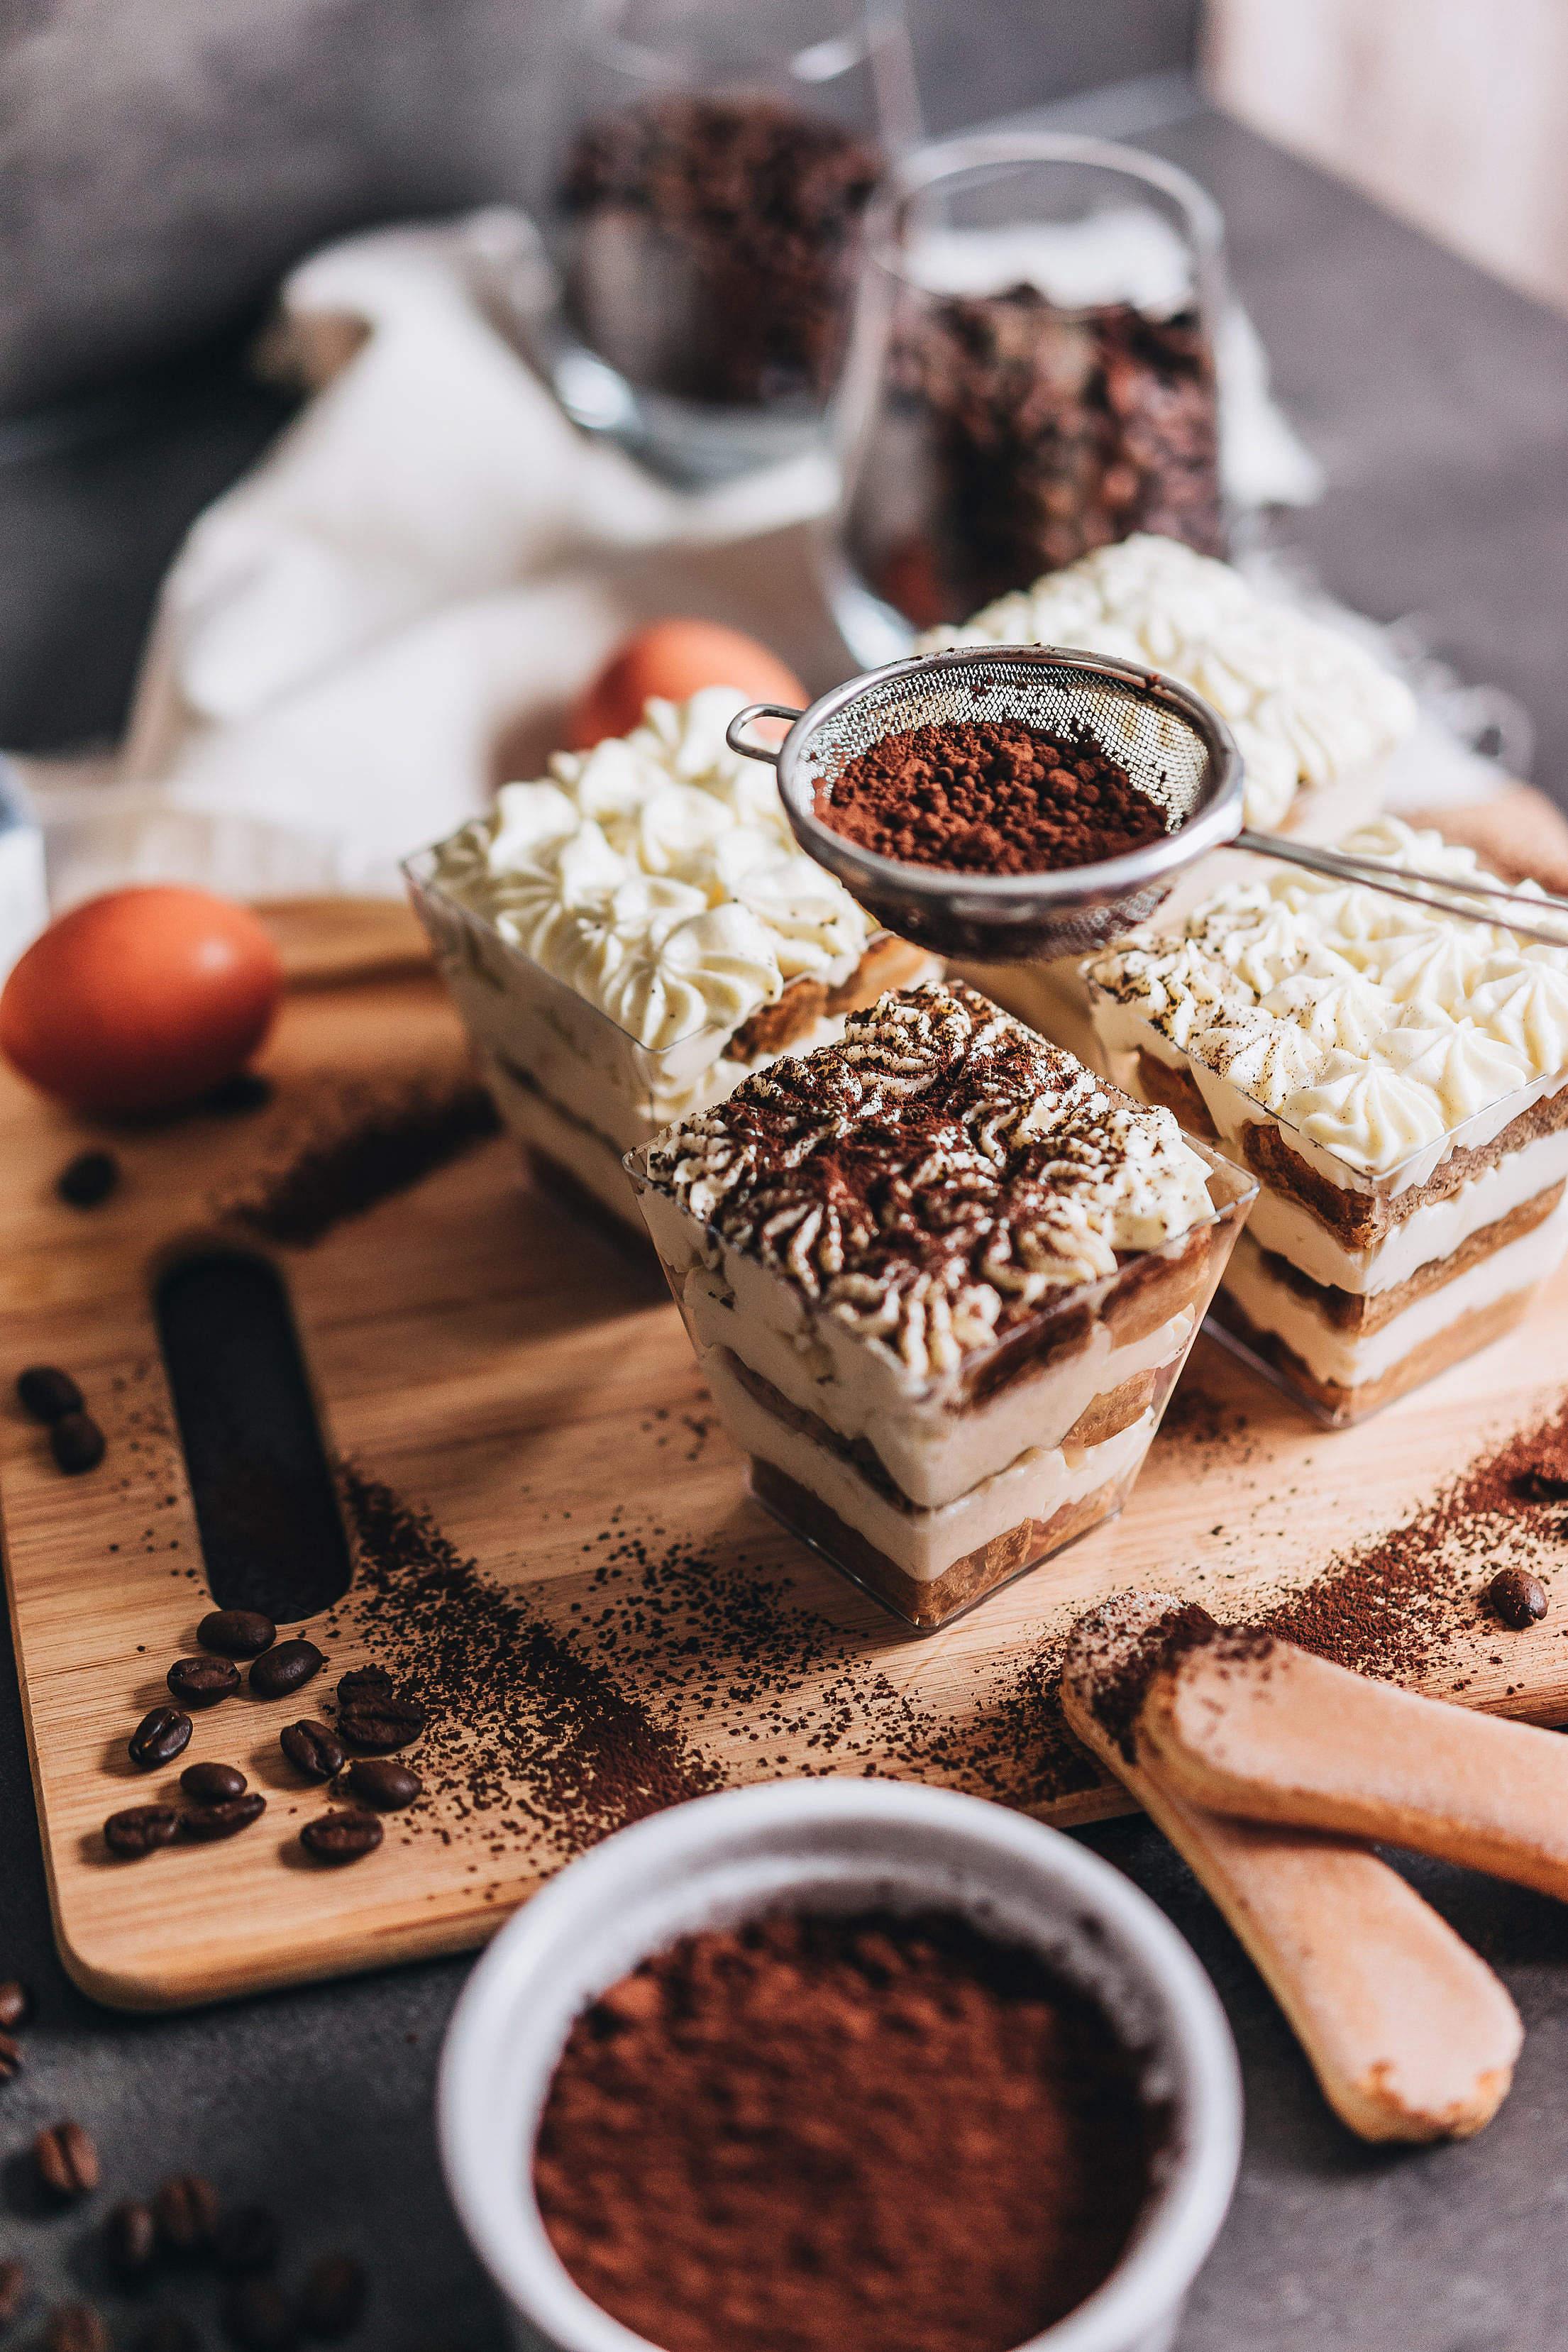 Sprinkling Cocoa Powder on Tiramisu Trifles Free Stock Photo